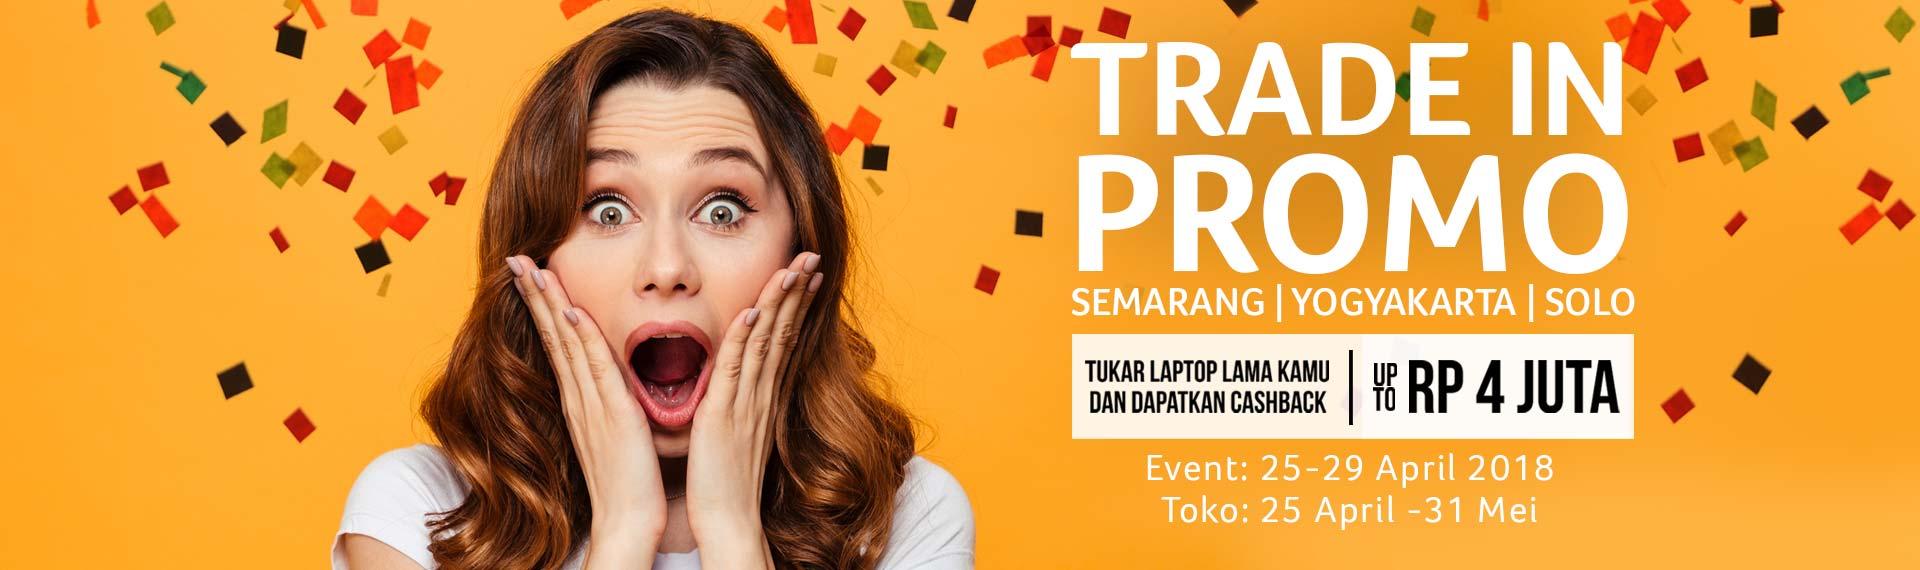 Promo Trade-in Acer: Tukar Tambah Laptop dengan Bonus Cashback Hingga Rp 4 Juta Rupiah!